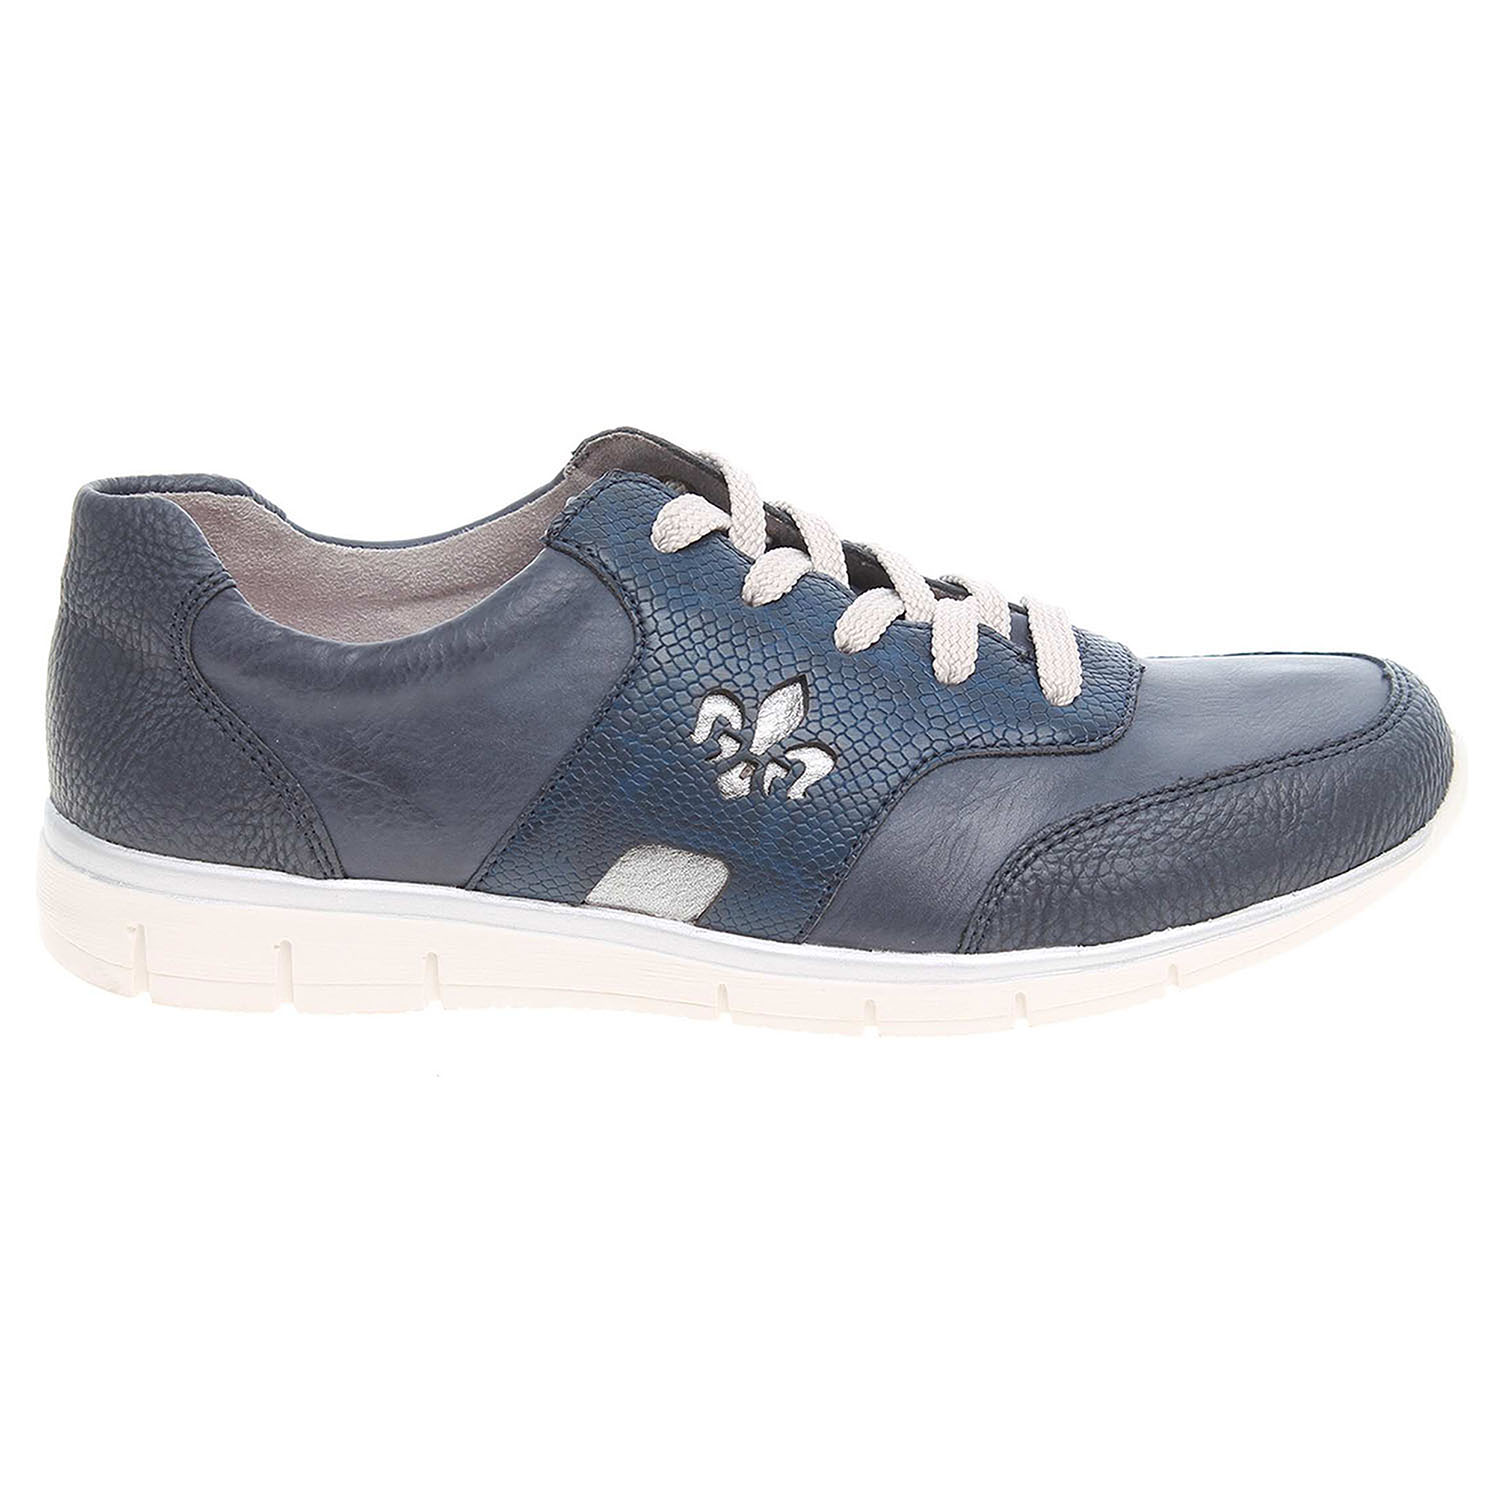 Rieker dámská obuv N4001-14 modrá 42